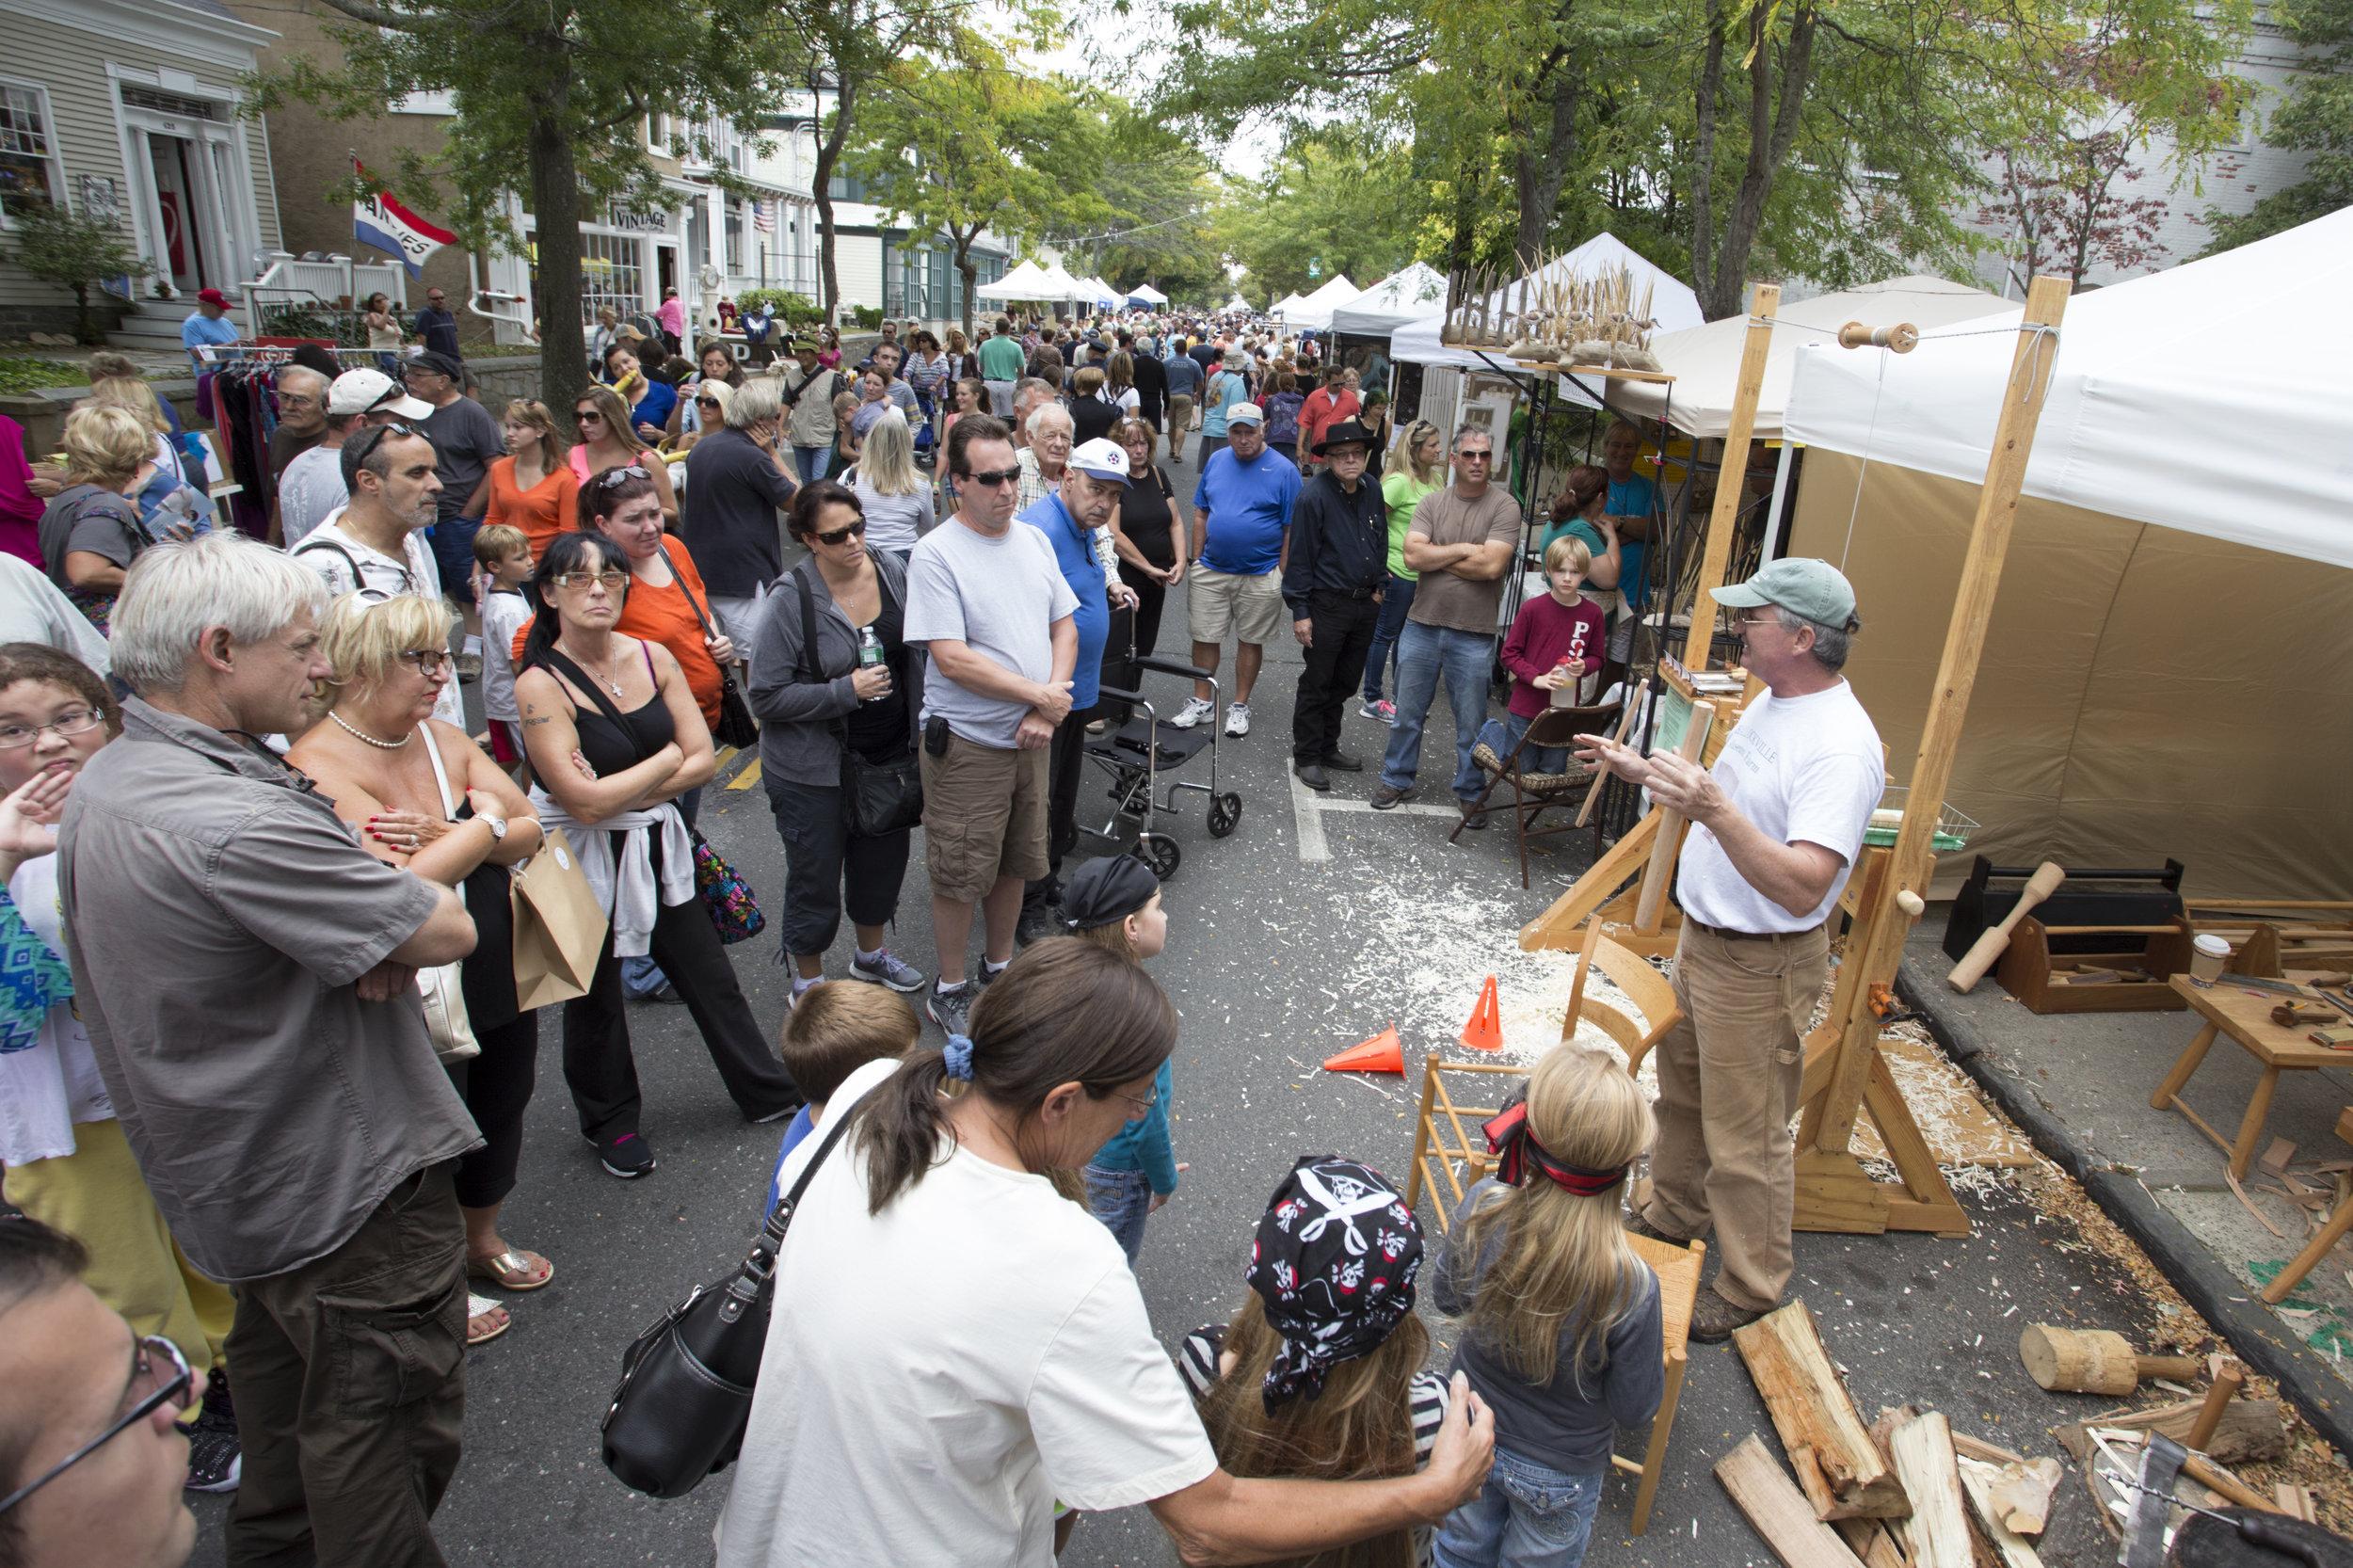 woodworking at Festival_Suffolk Times photo by Katharine Schroeder.jpg